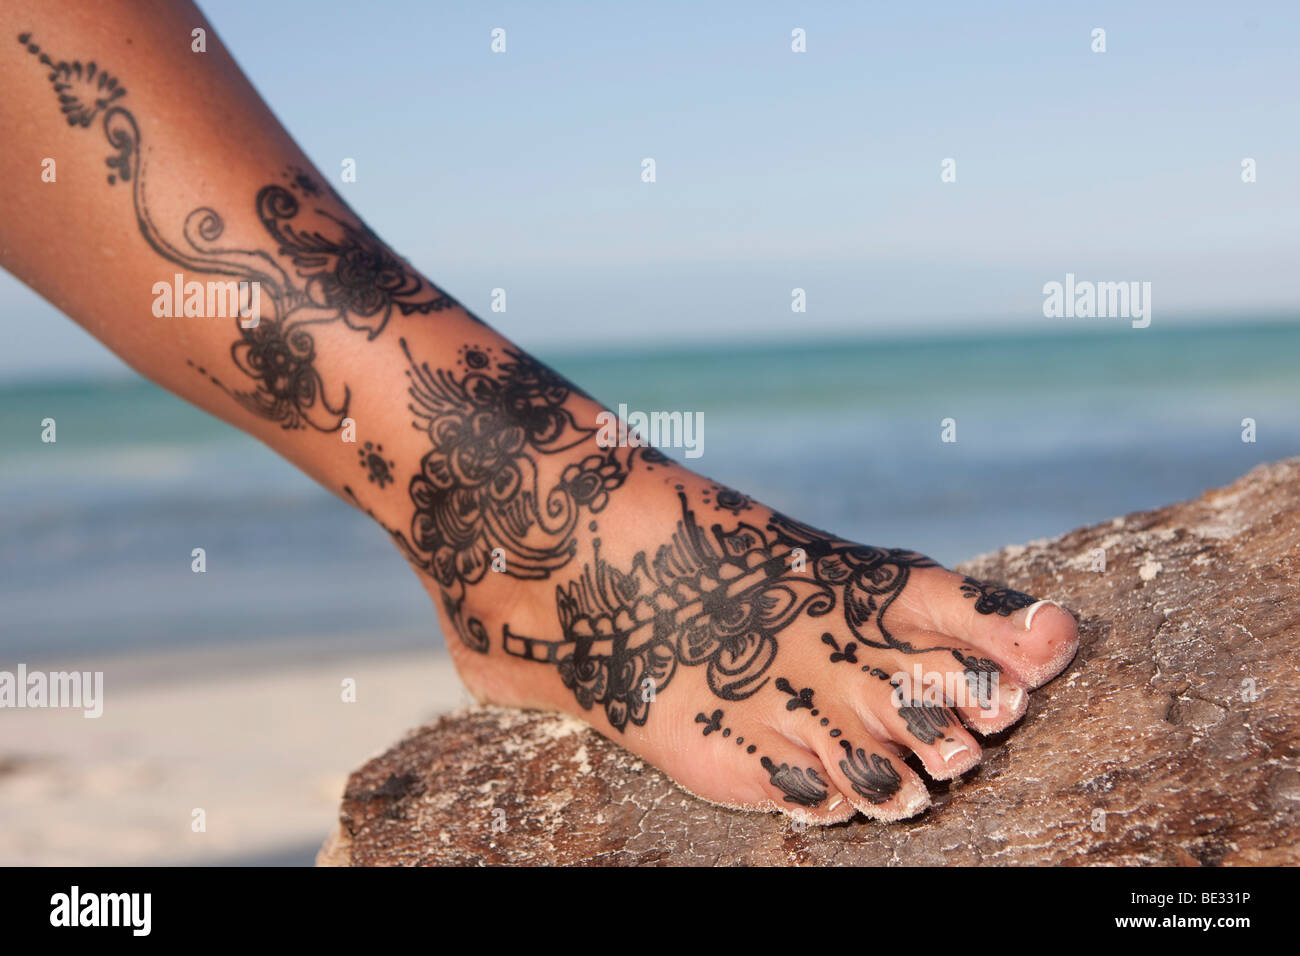 Henna Tattoo On A Foot Stock Photo 25883810 Alamy